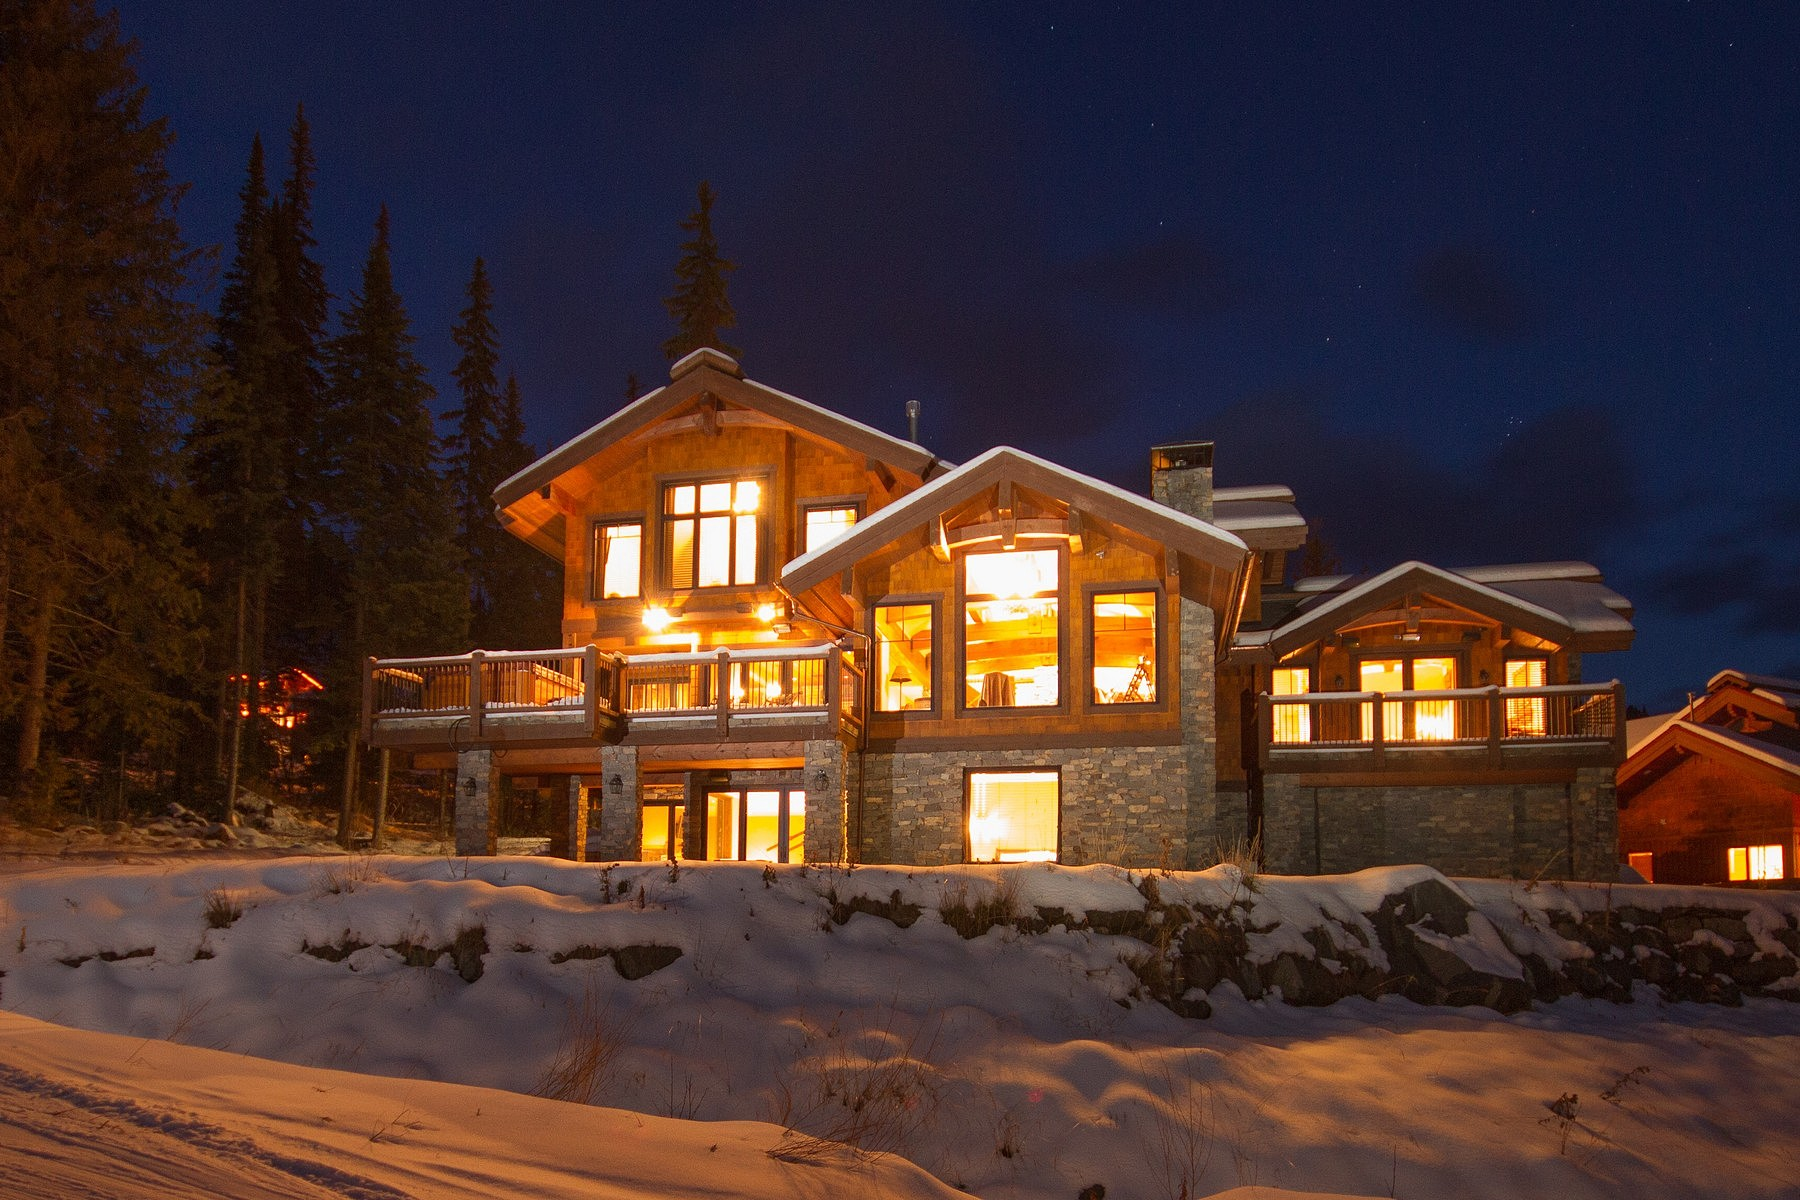 Частный односемейный дом для того Продажа на Premium Slope Side Mountain Chalet 4121 Sundance Drive Sun Peaks, Британская Колумбия, V0E 5N0 Канада